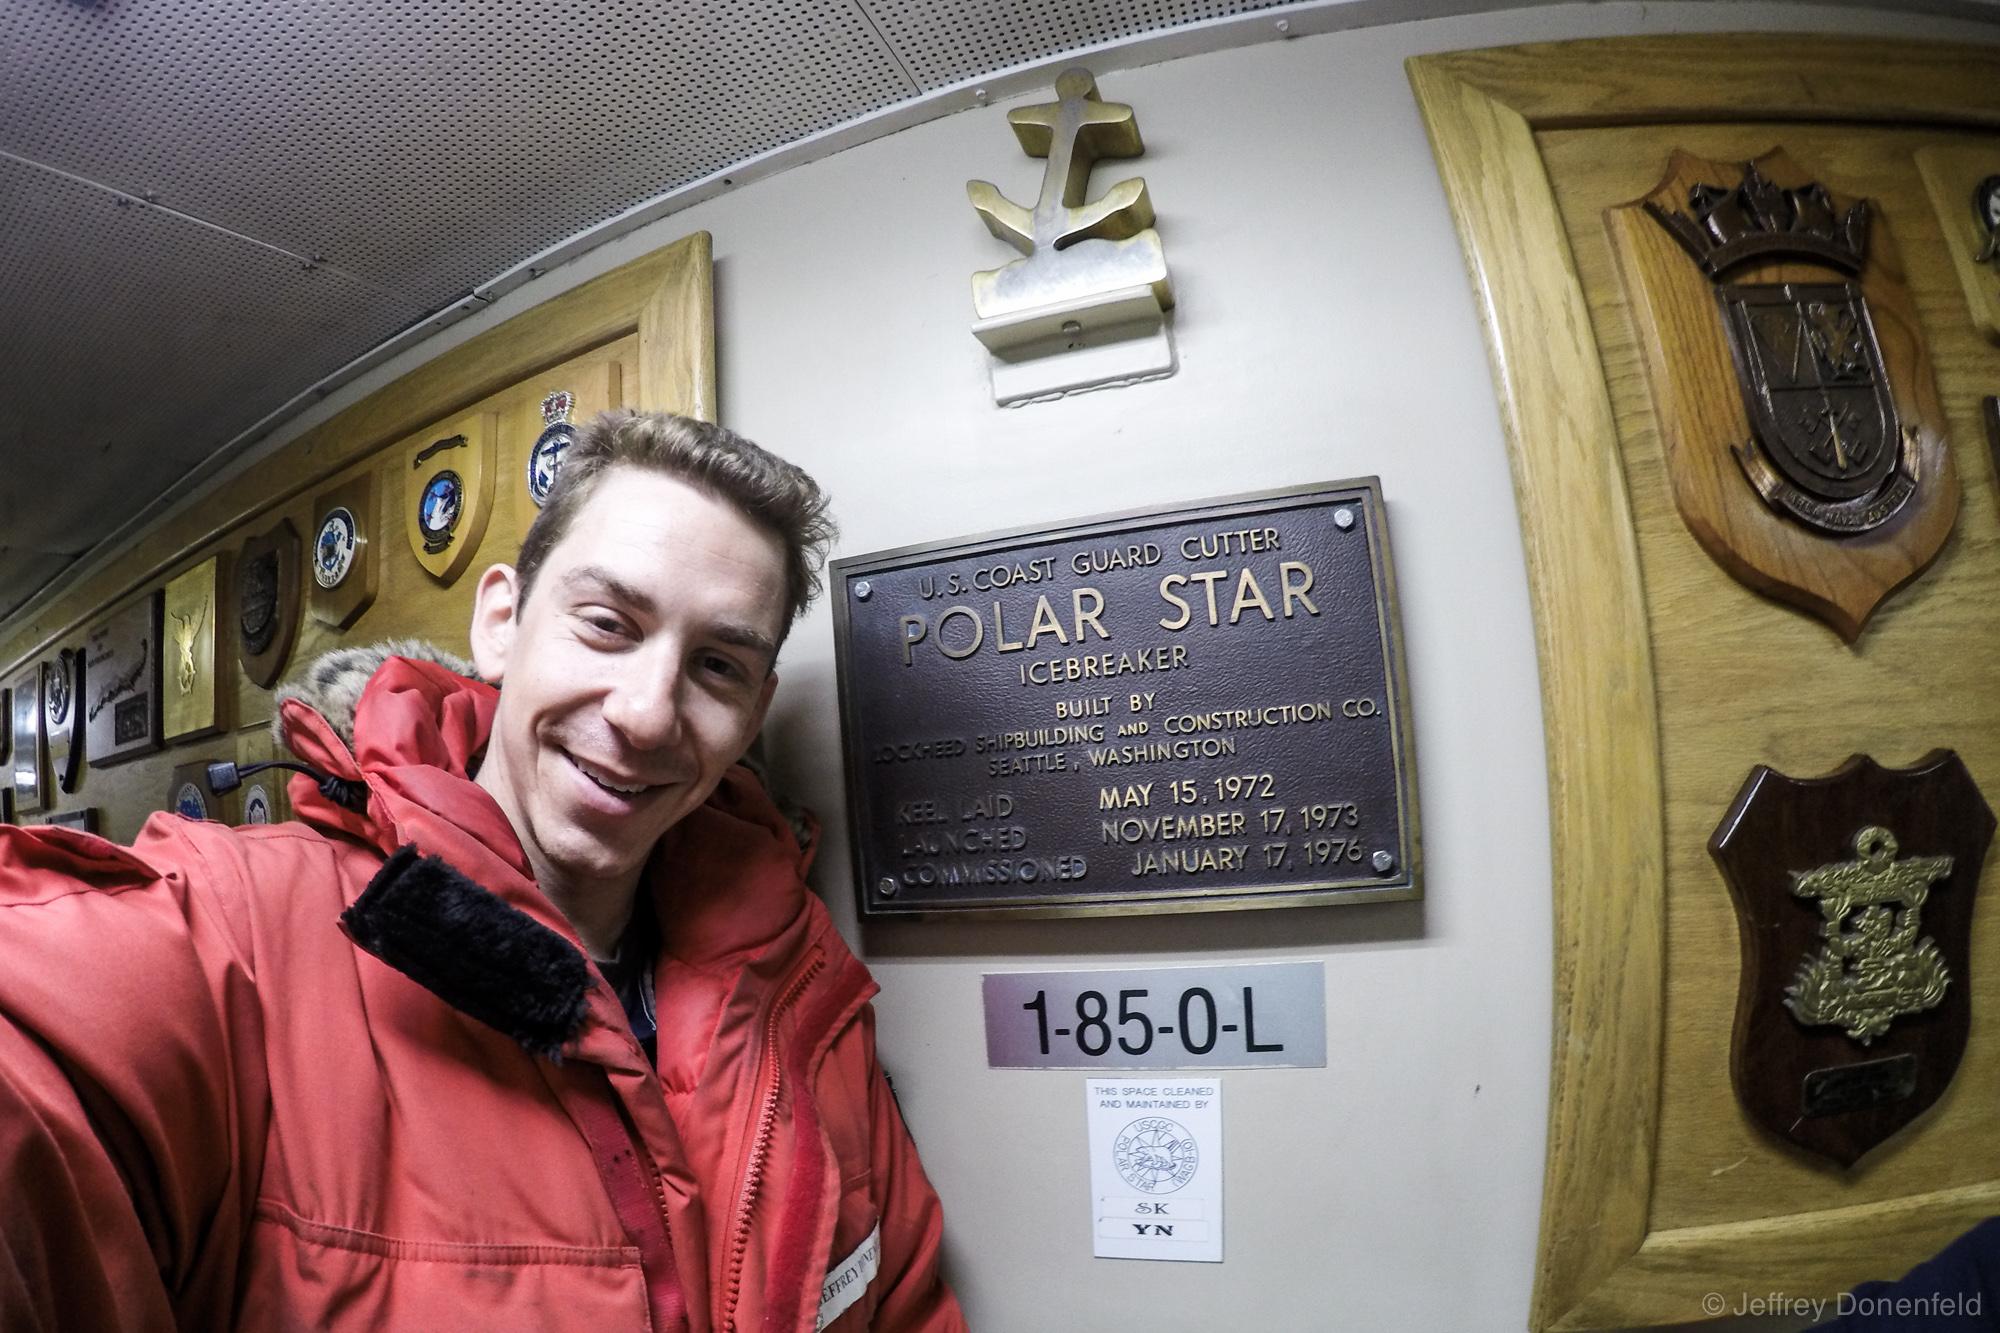 The USCGC Polar Star Icebreaker ship commissioning plaque.